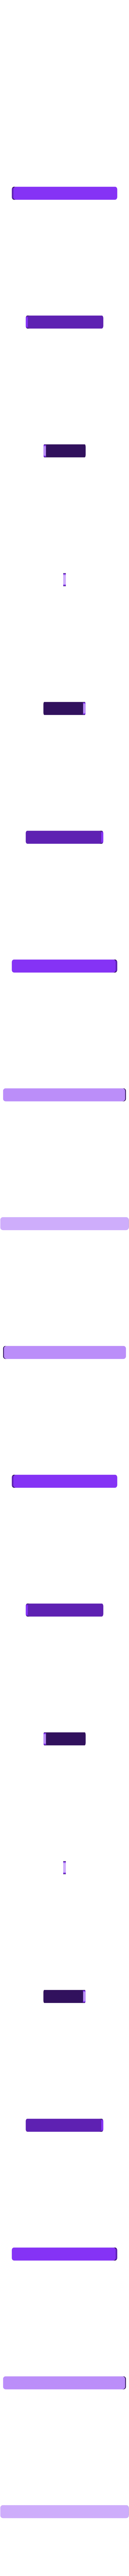 Support-5troux.stl Download free STL file Modular reminder • 3D print template, rfbat